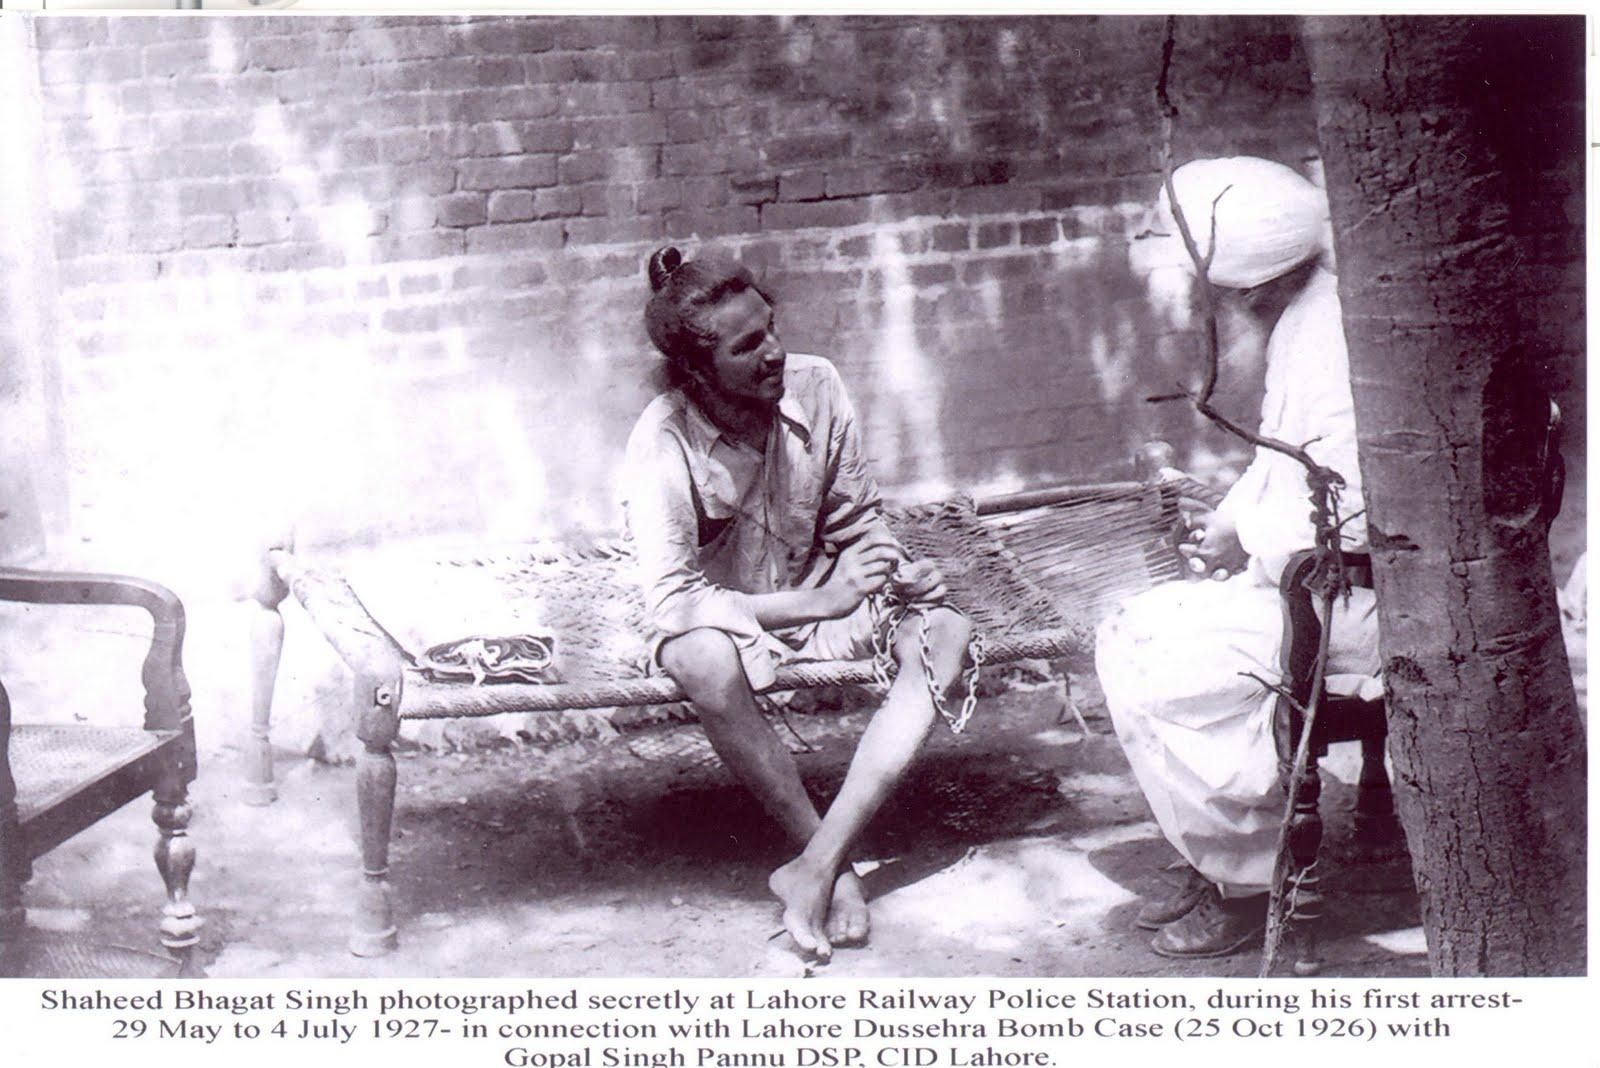 Shaheed Bhagat Singh 1927